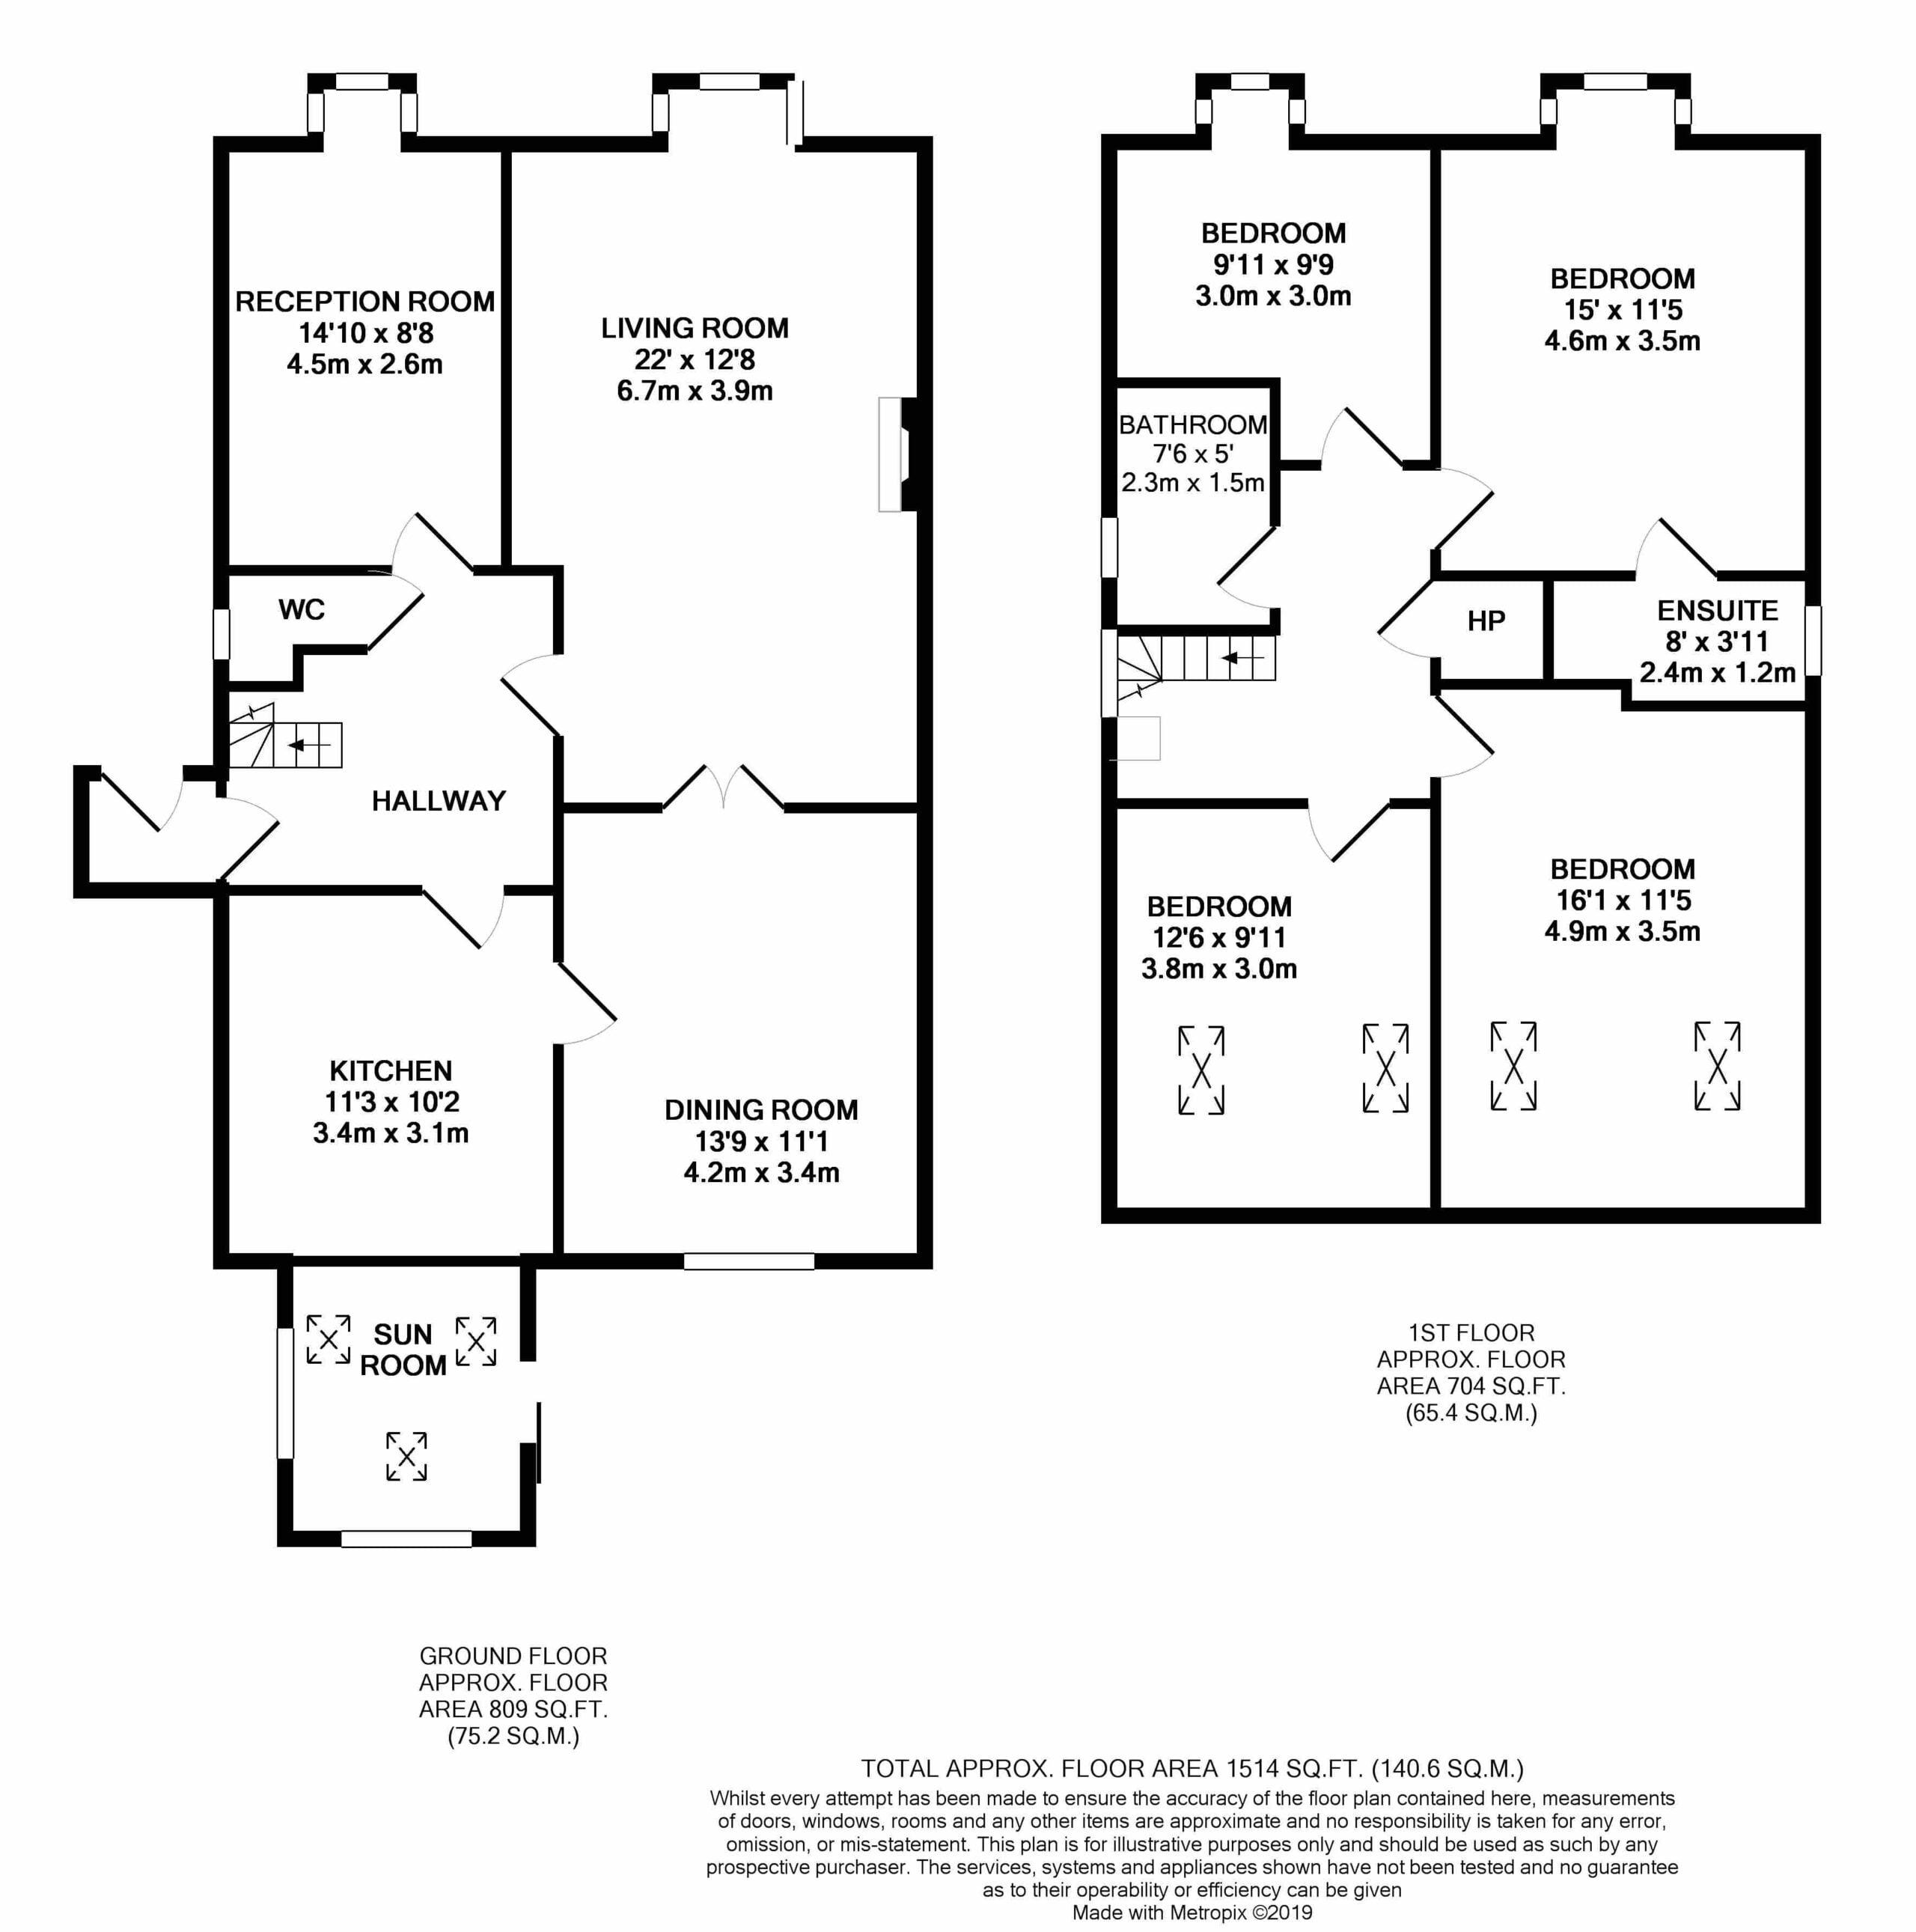 Floor Plan A 22.3.19